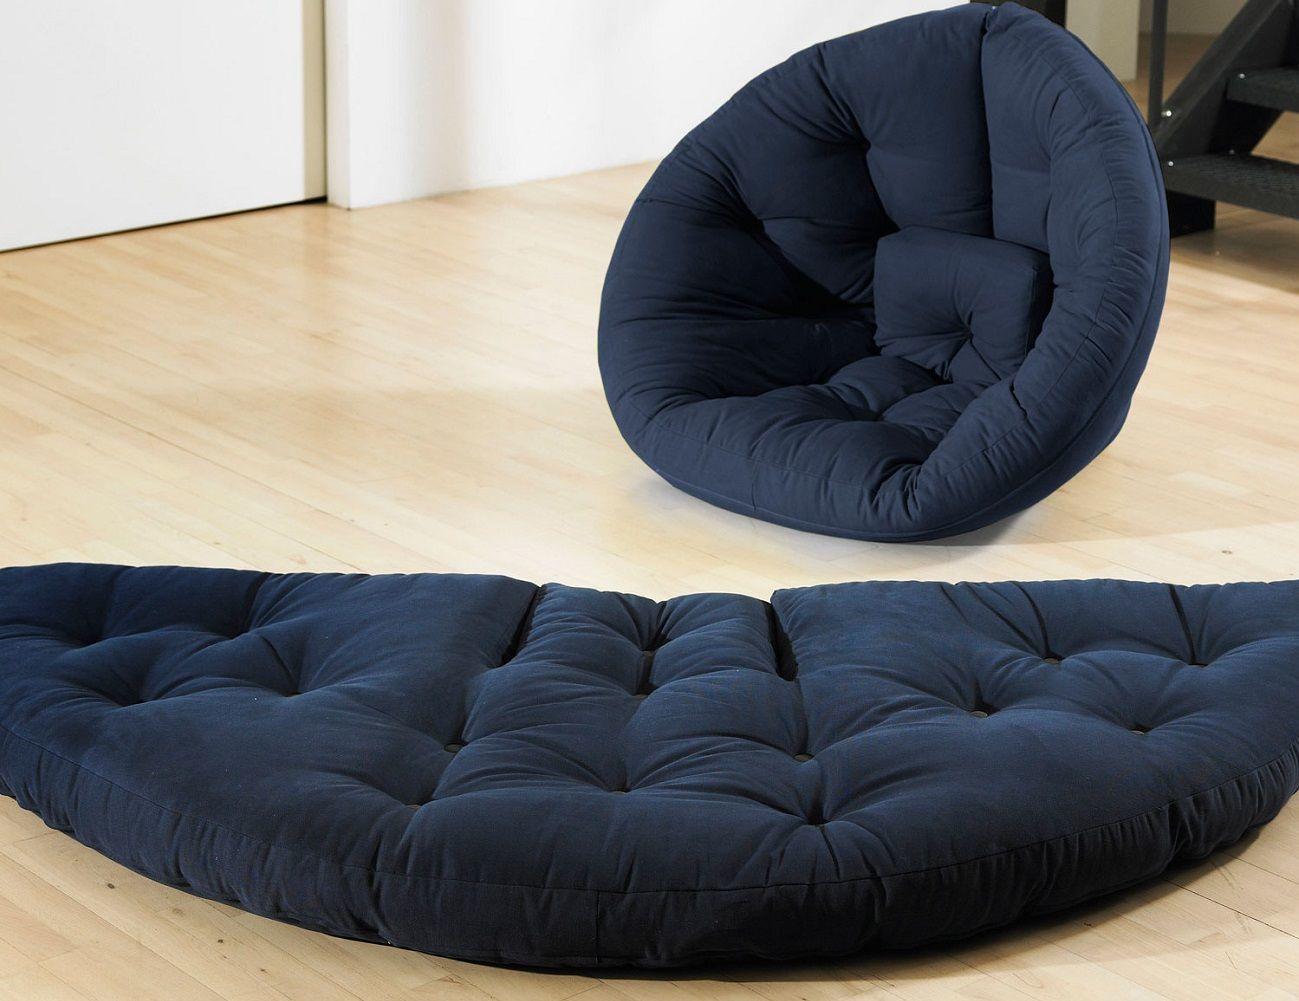 chair to bed convertible office mat 48 x 60 fresh futon nido gadget flow